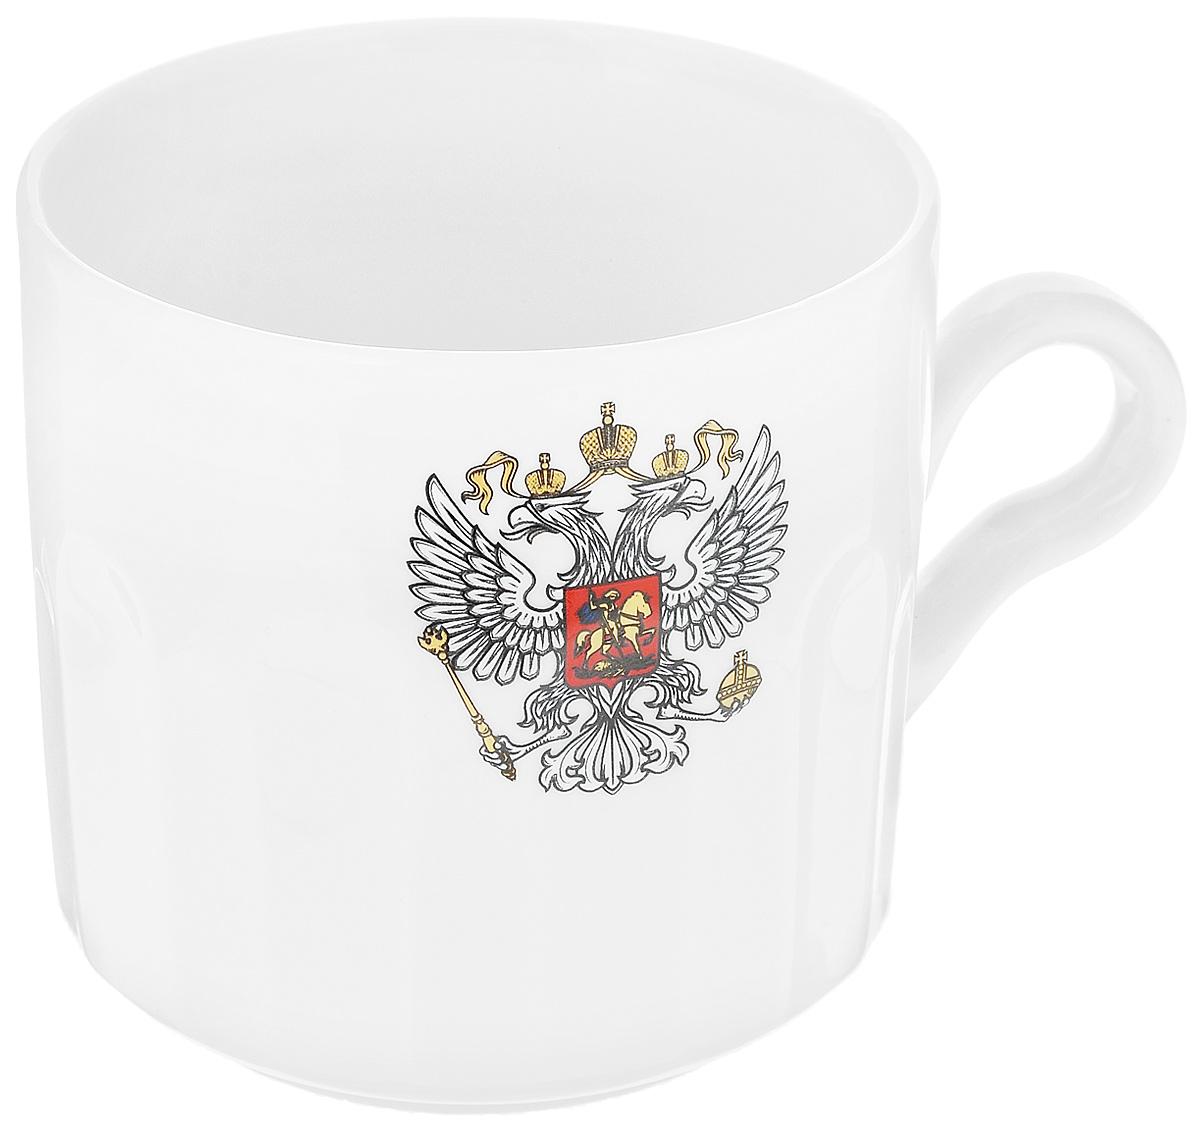 Кружка Фарфор Вербилок Герб, 500 мл кружка фарфор вербилок герб 250 мл